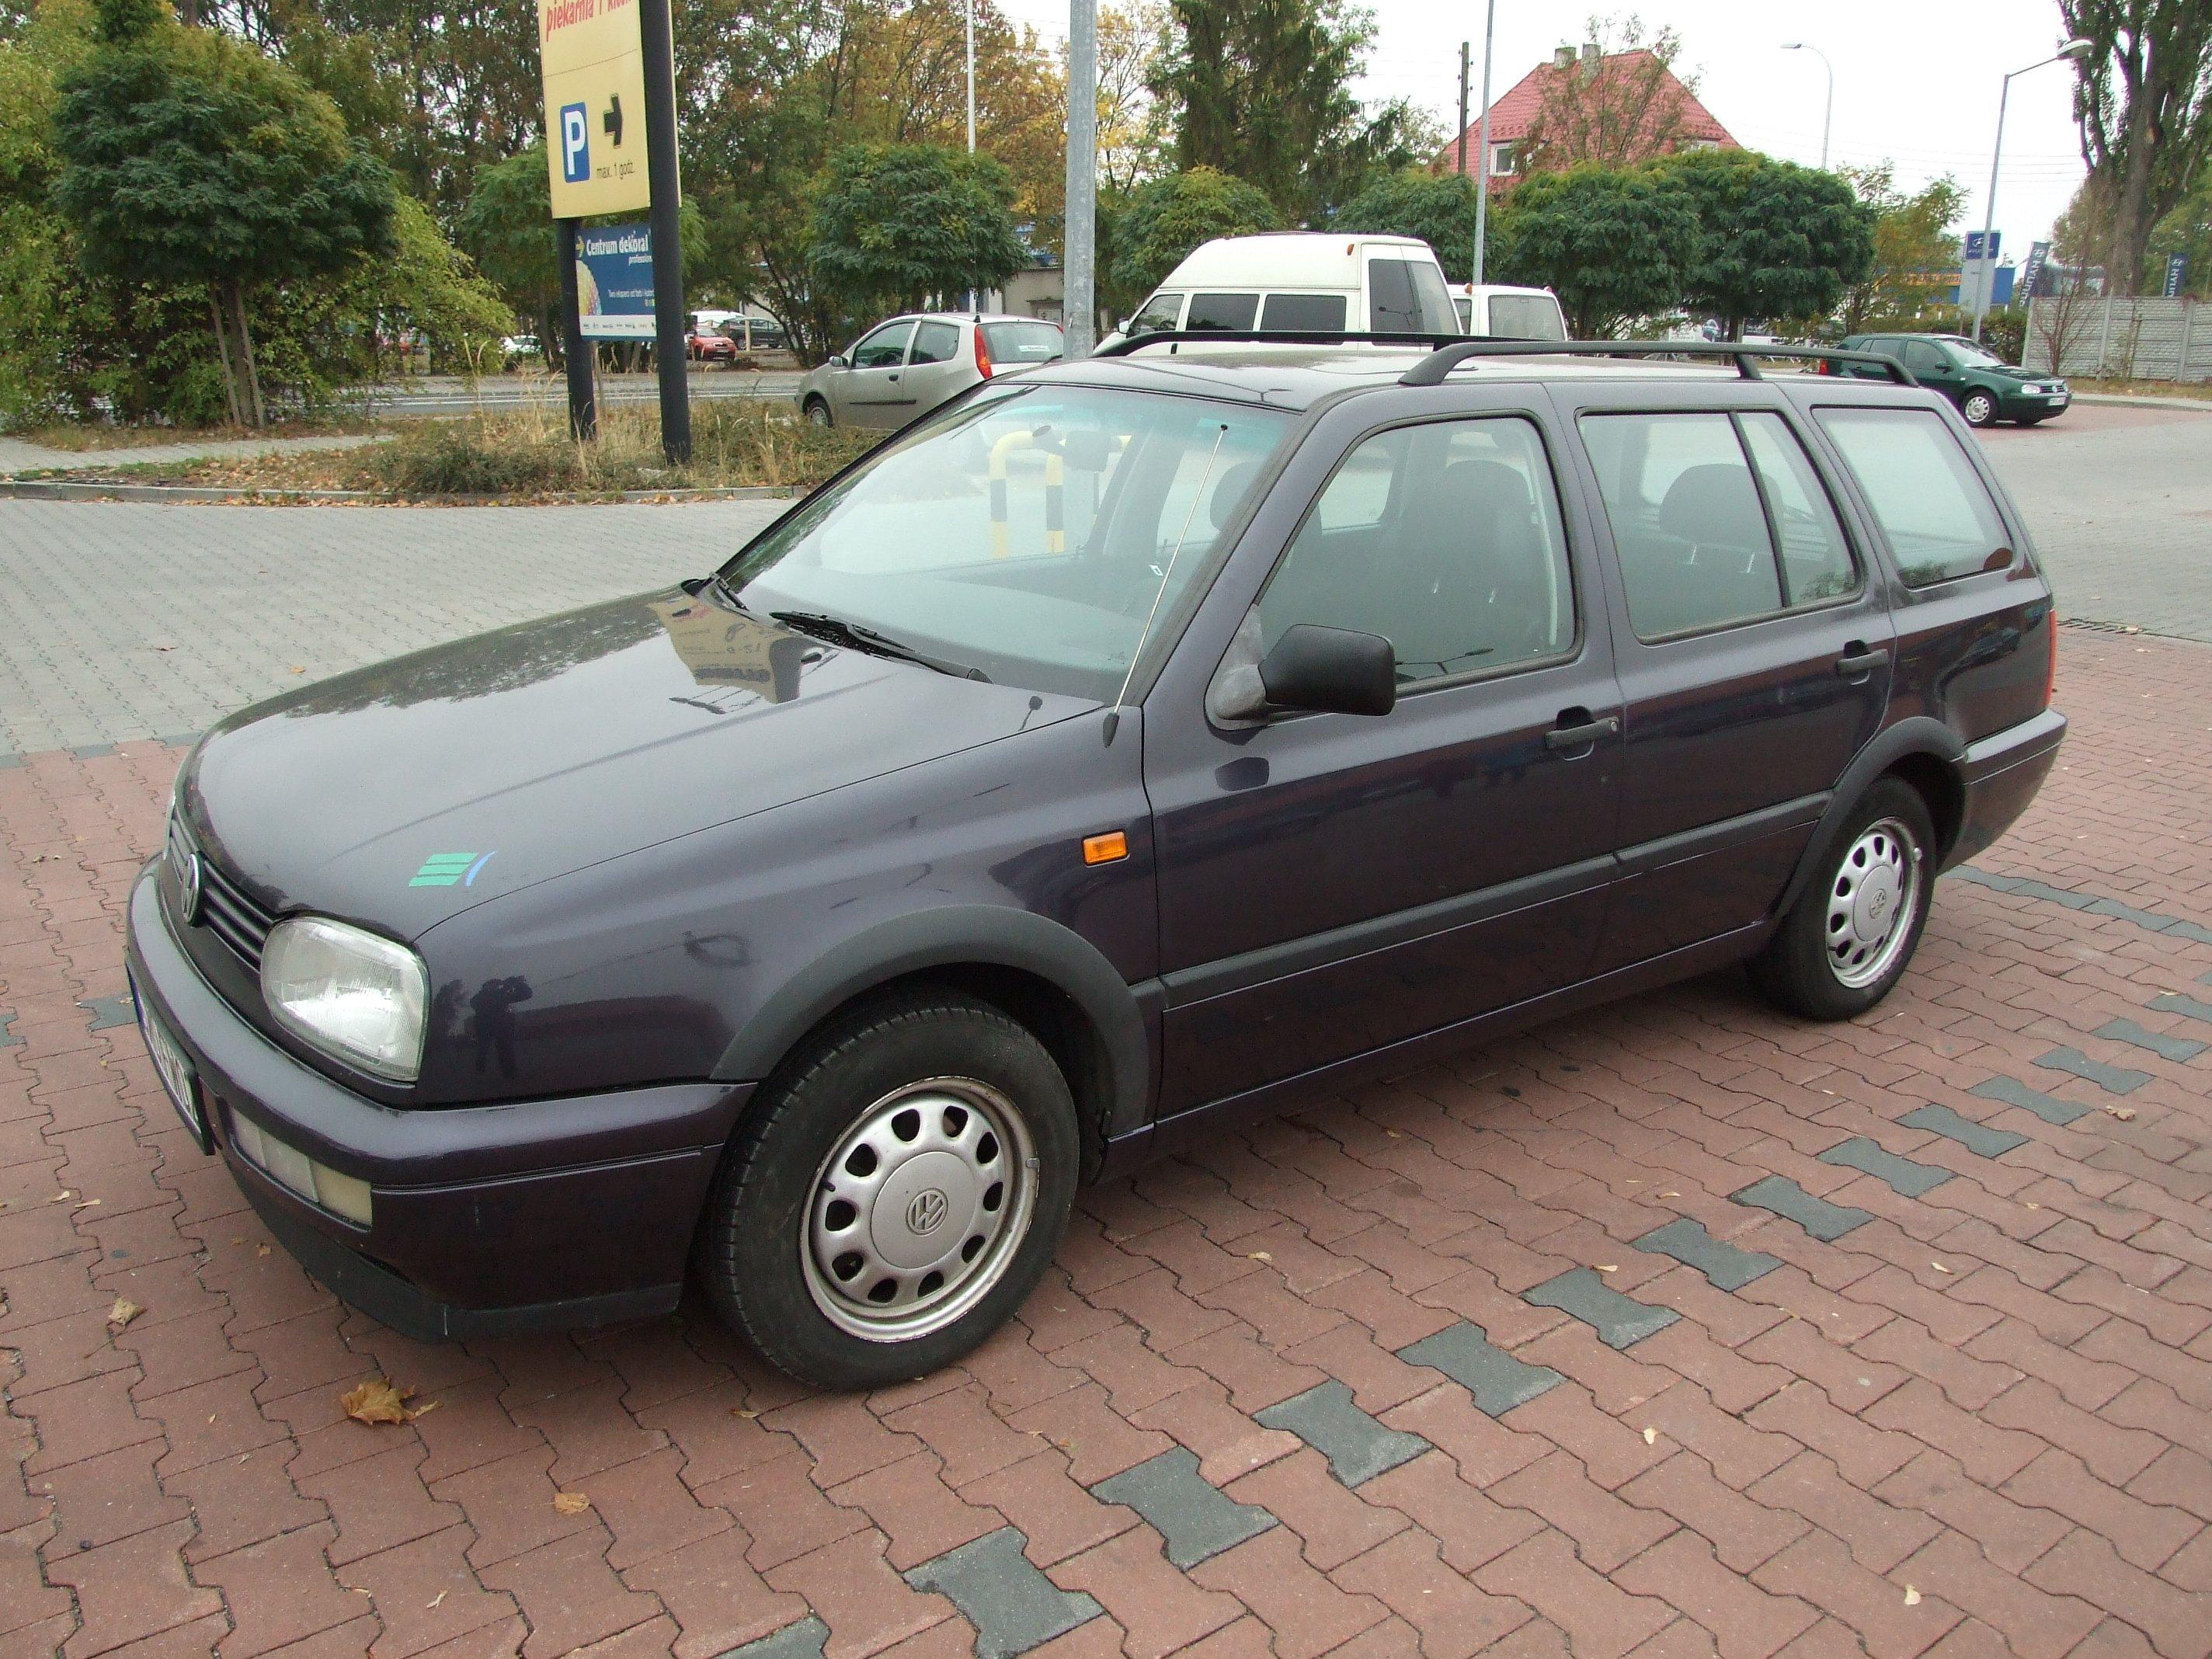 VW Golf 3 Variant 1.8 benzyna + LPG